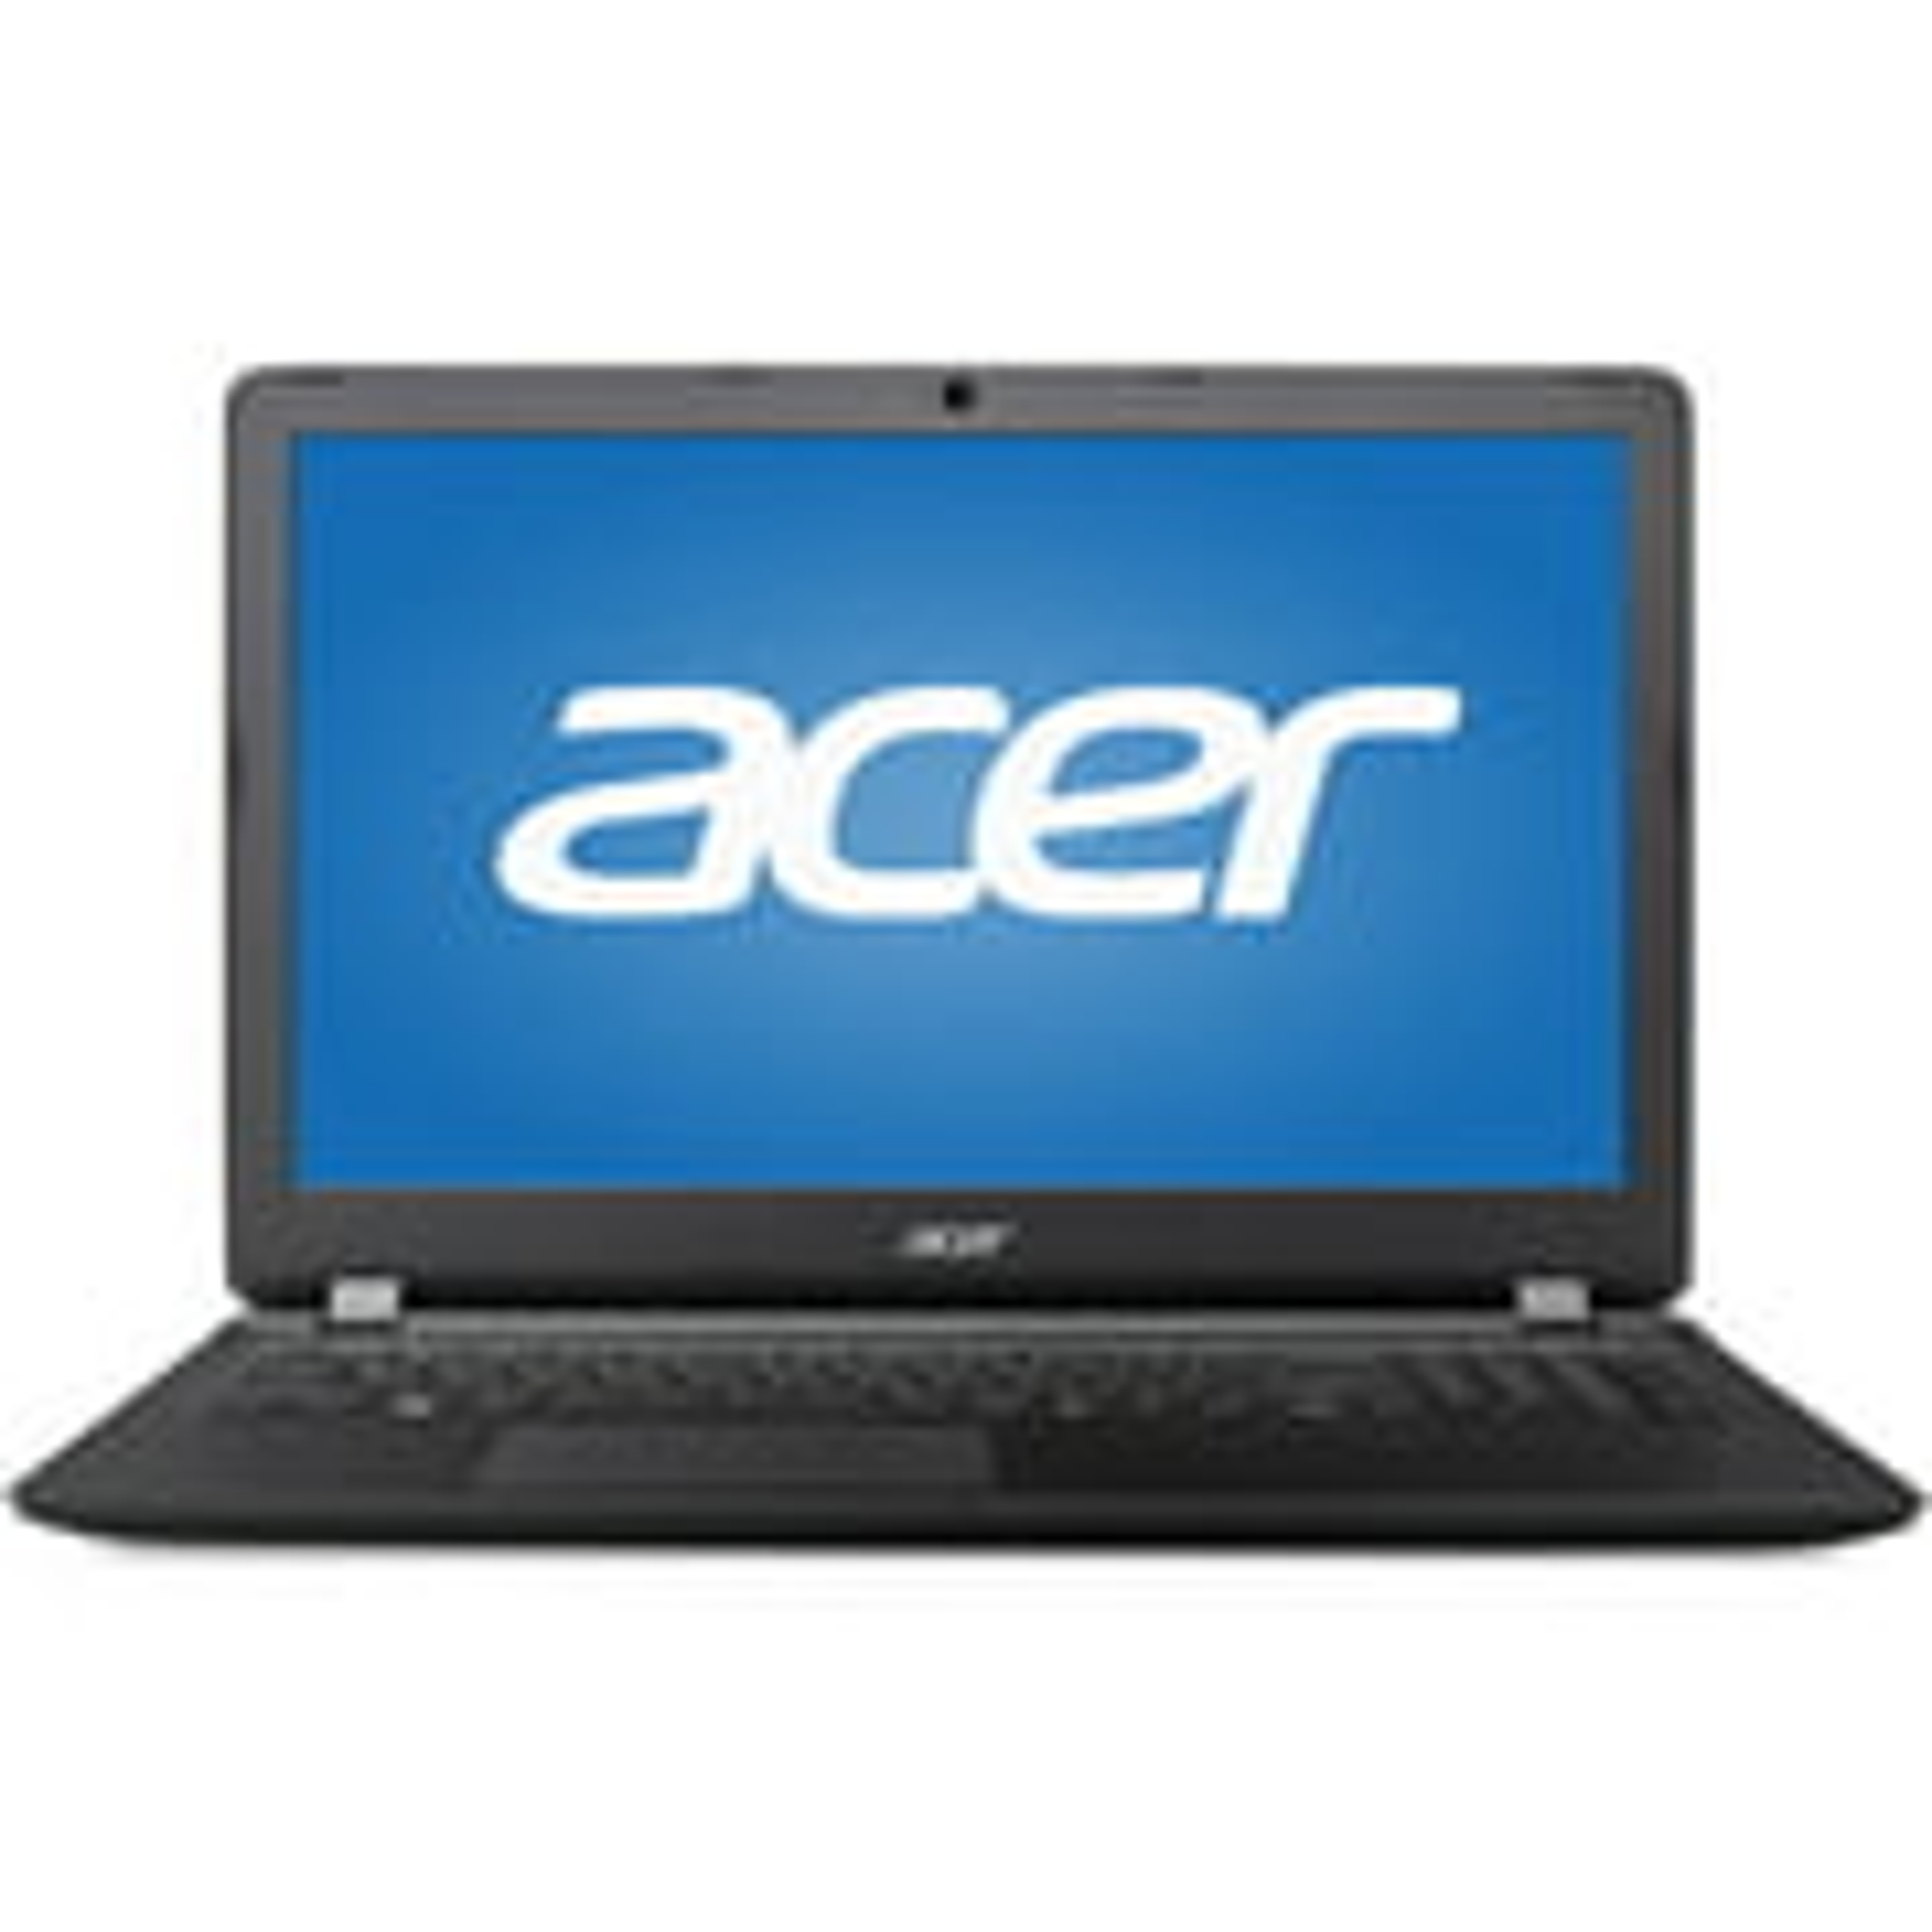 "Acer Aspire ES1-572-31XL 15.6"" Laptop, Windows 10 Home, Intel Core i3-6100U Dual-Core Processor, 4GB Memory, 1TB Hard Drive"